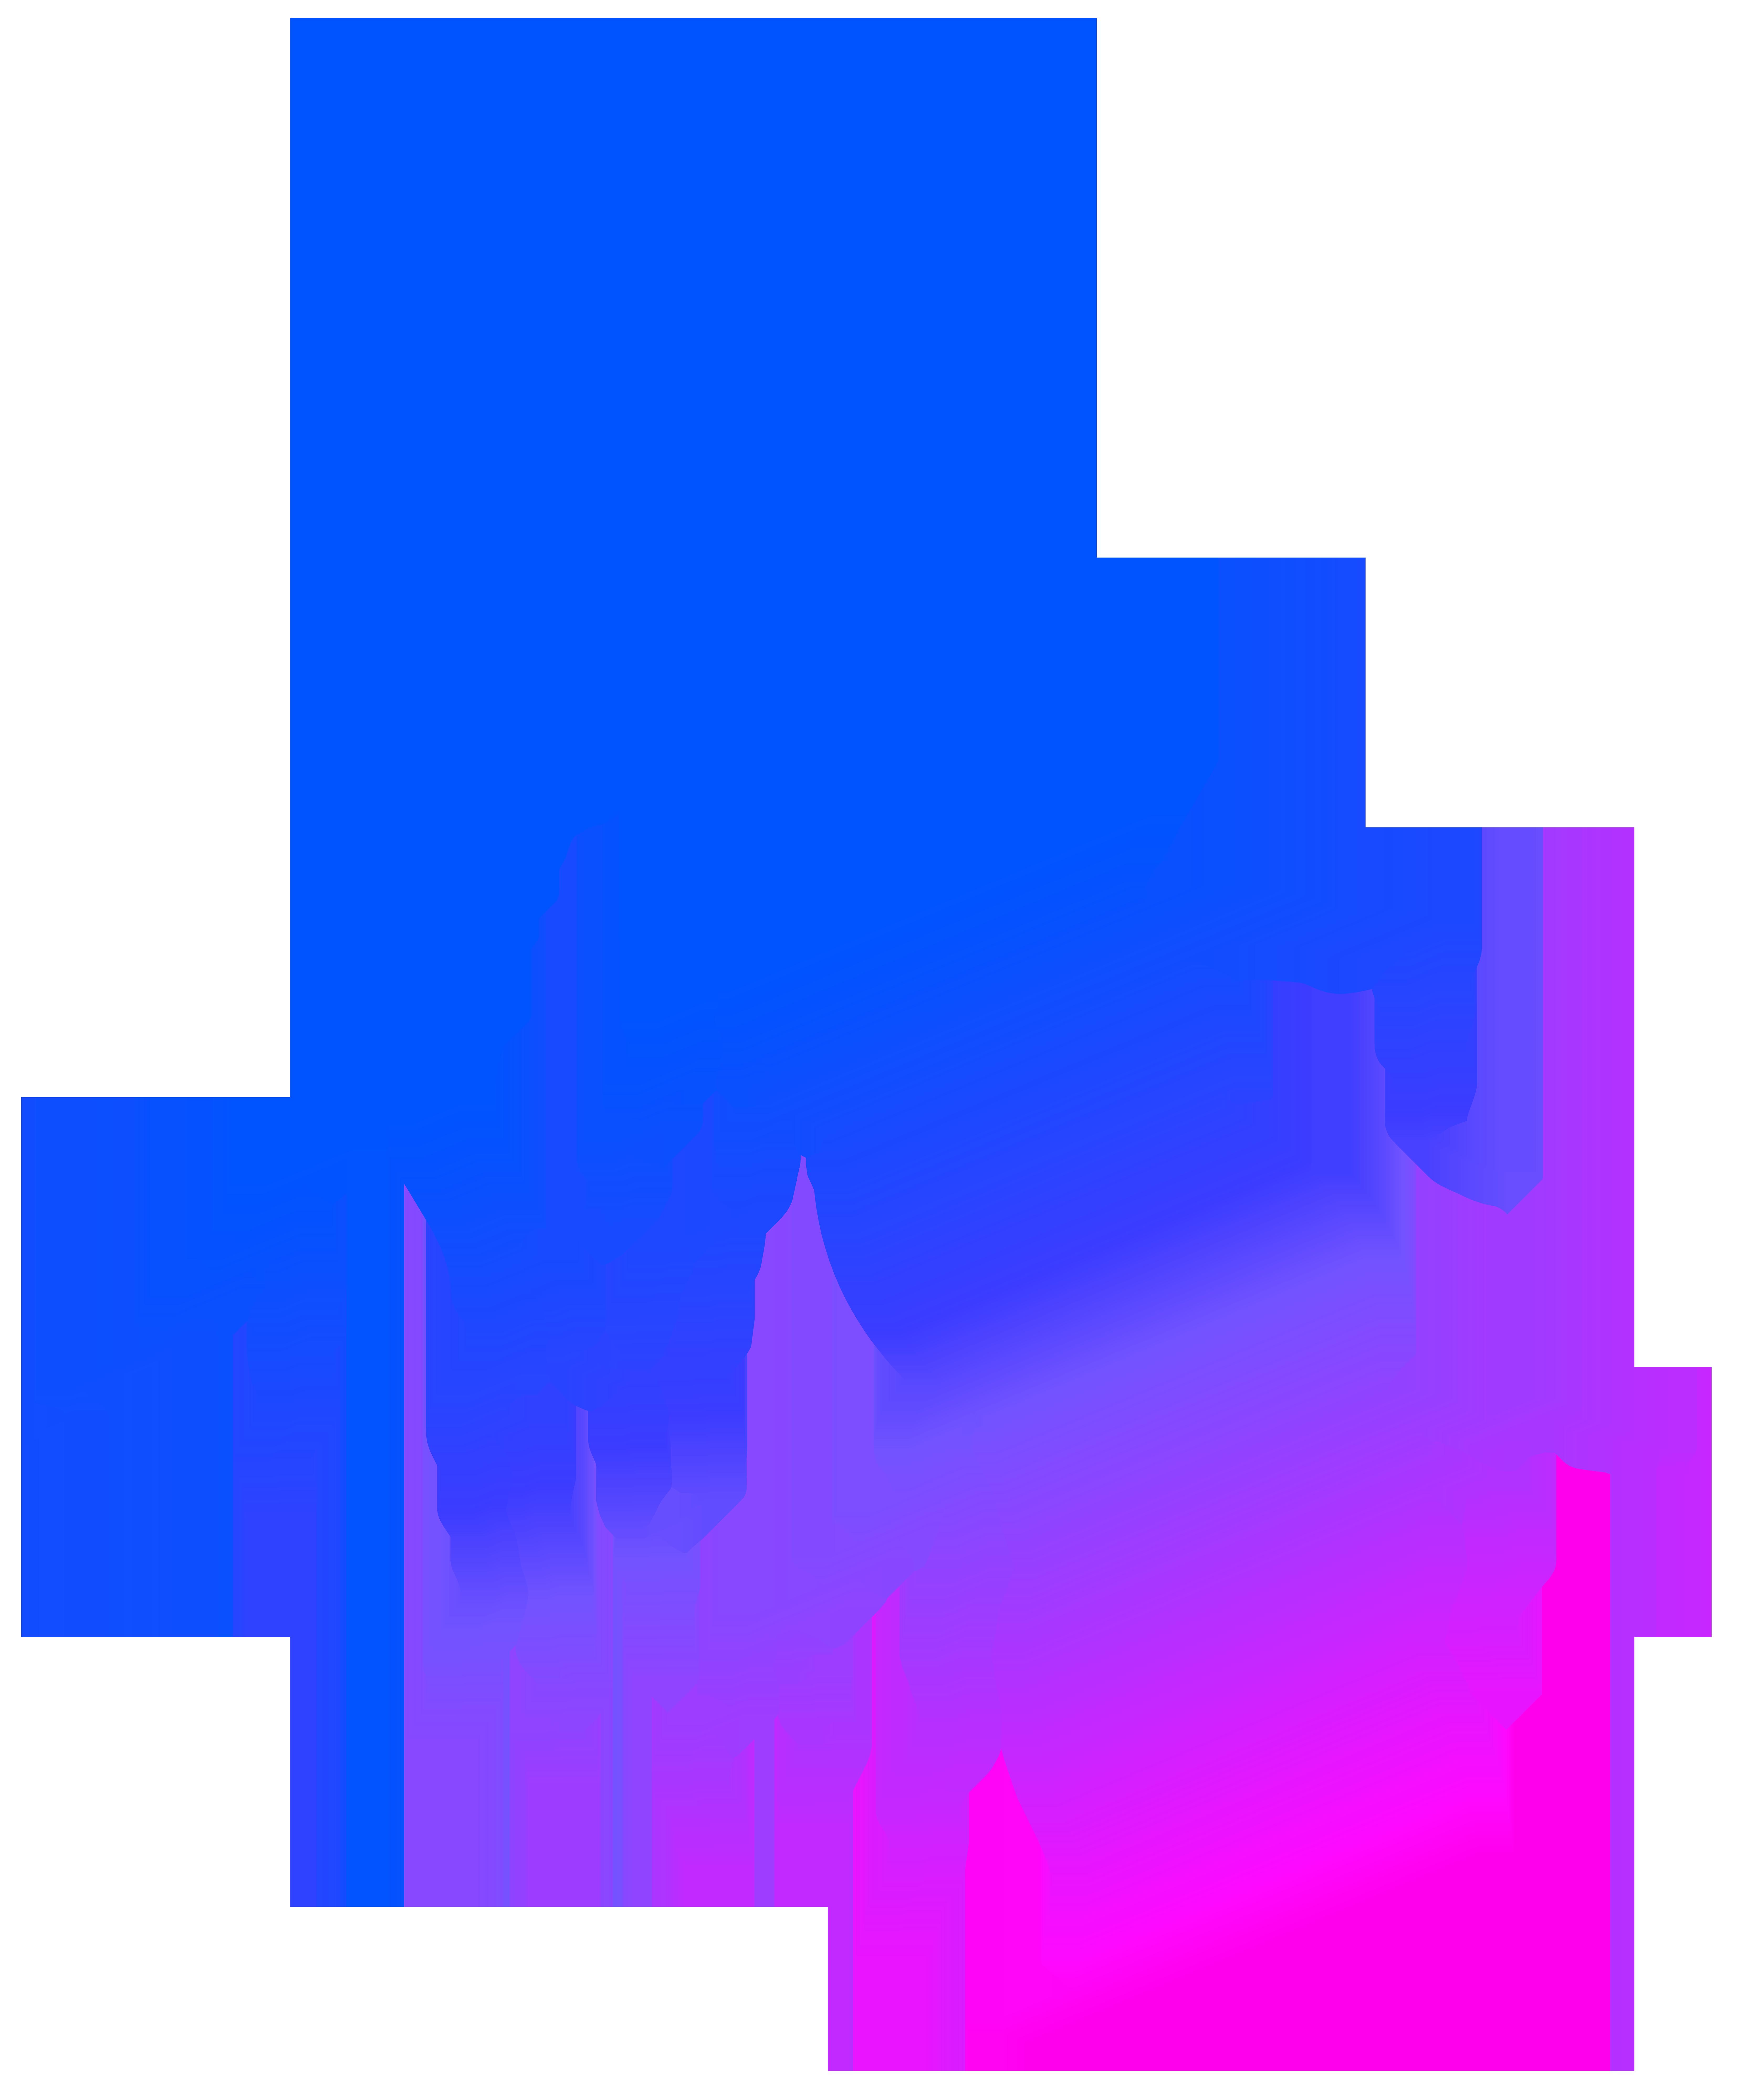 6711x8000 Colorful Lightning PNG Transparent Clip Art Imageu200b Gallery